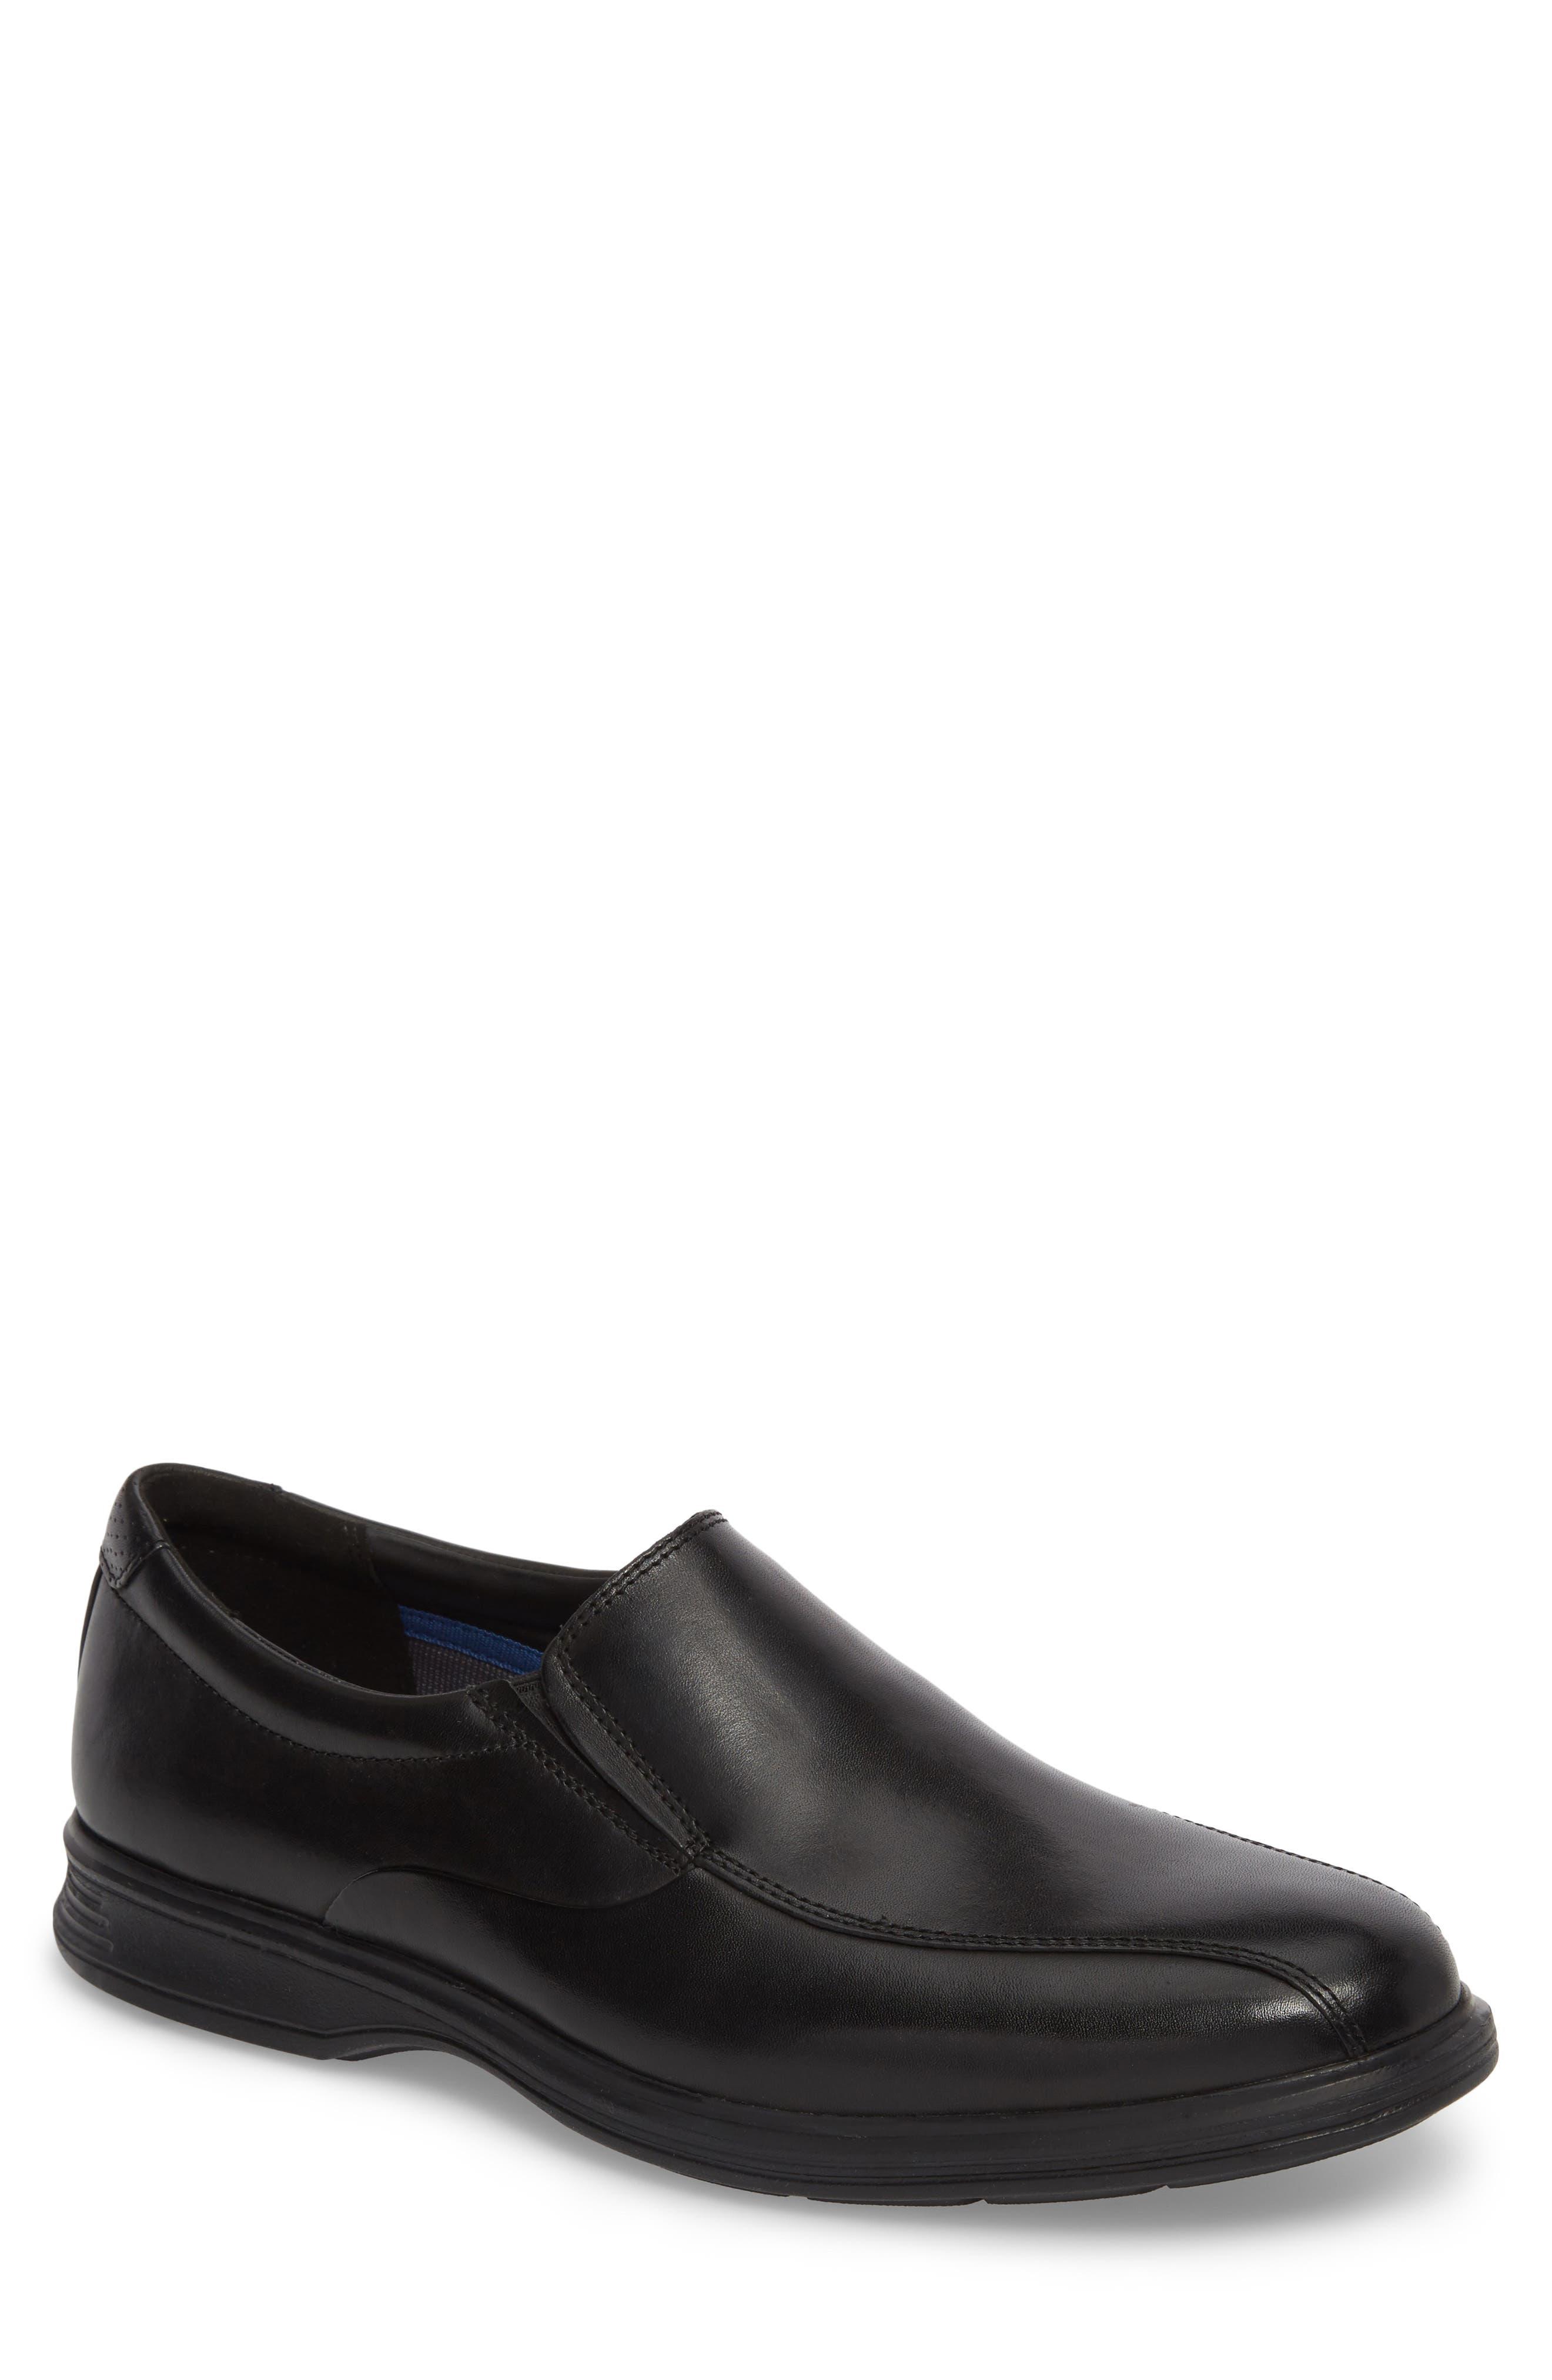 Dressports 2 Lite Venetian Loafer,                         Main,                         color, Black Leather